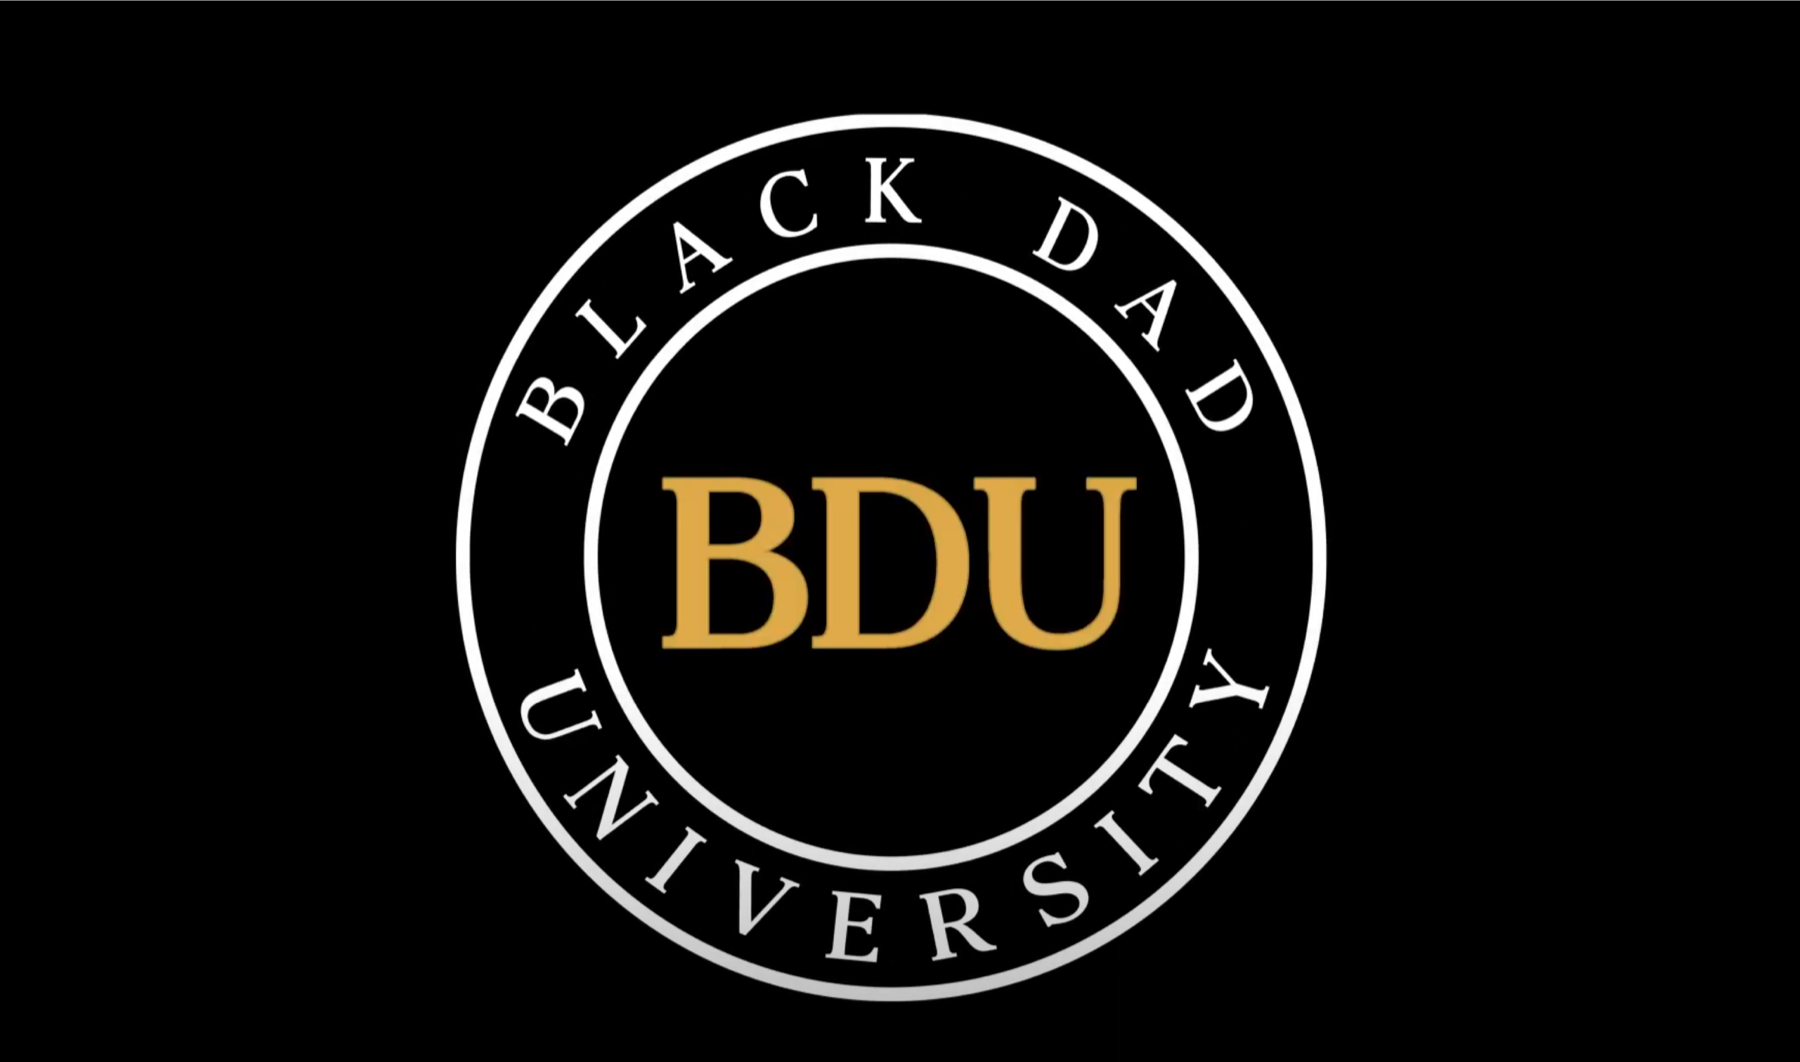 Black Dad University BDU seal